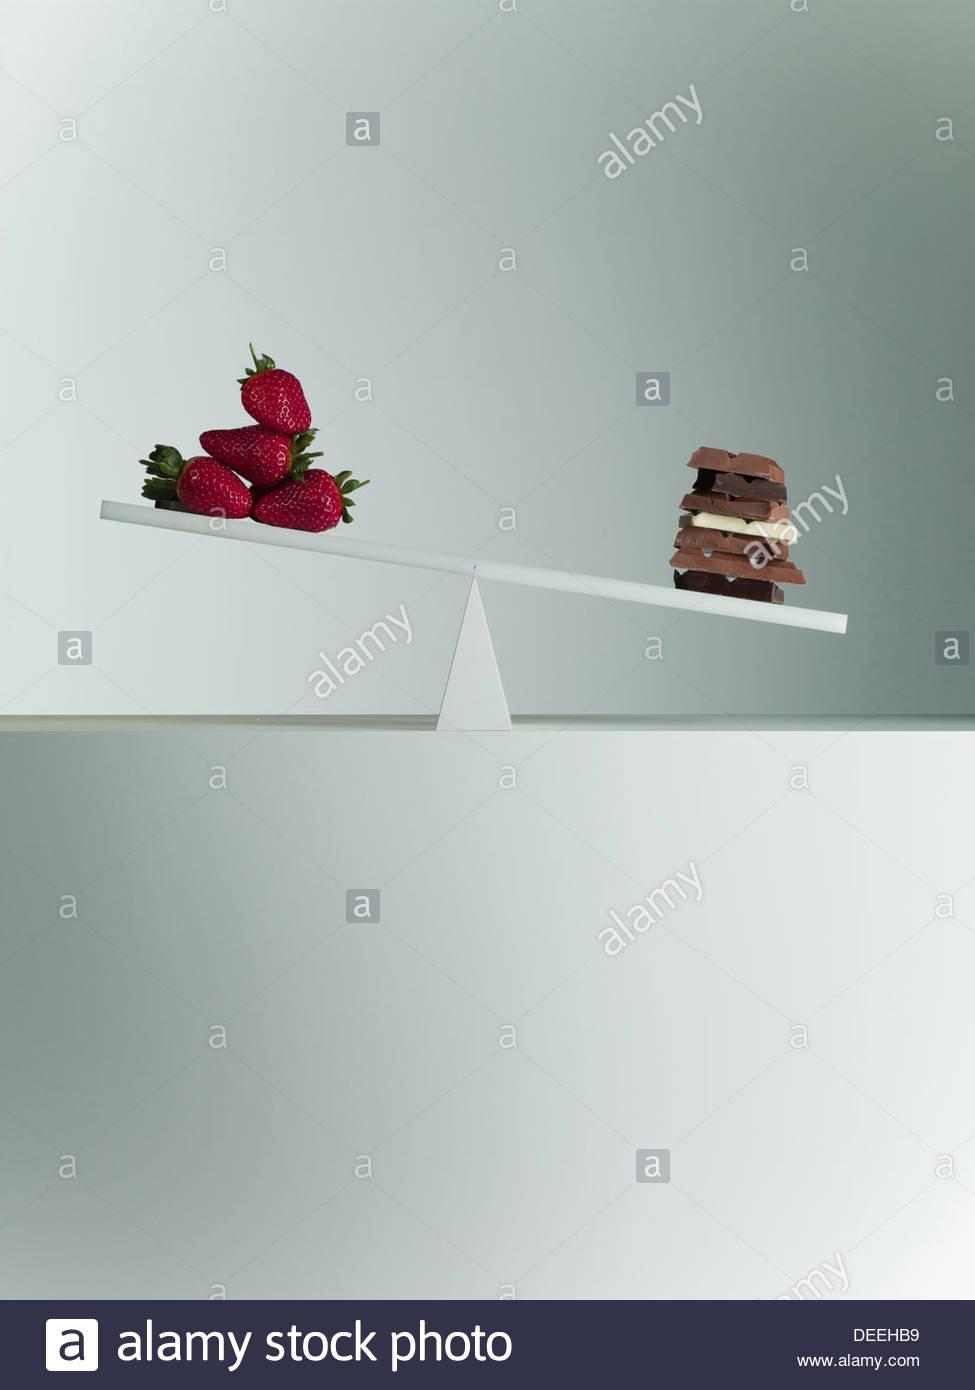 Schokoriegel, Kipp-Wippe mit Erdbeeren am gegenüberliegenden Ende Stockbild